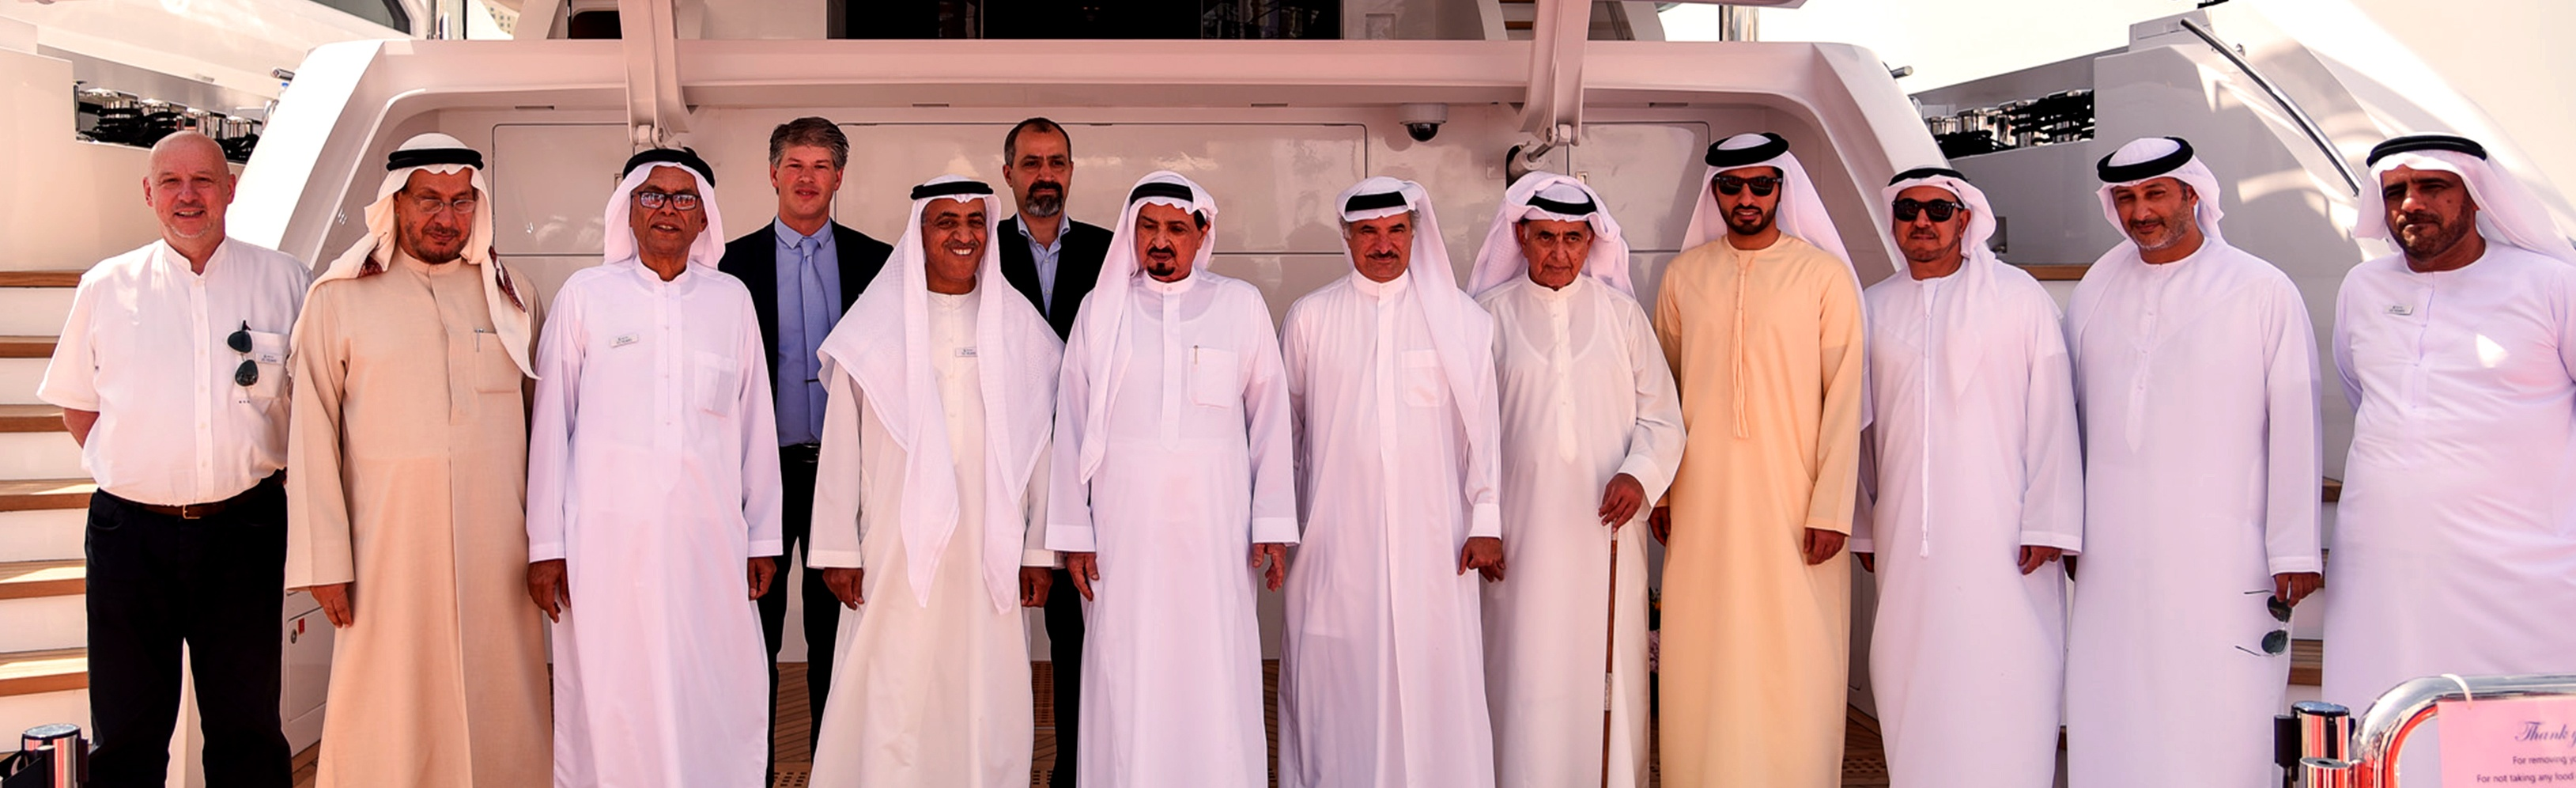 HH-Humaid-bin-Rashid-Al-Nuaimi,-Gulf-Craft.jpg